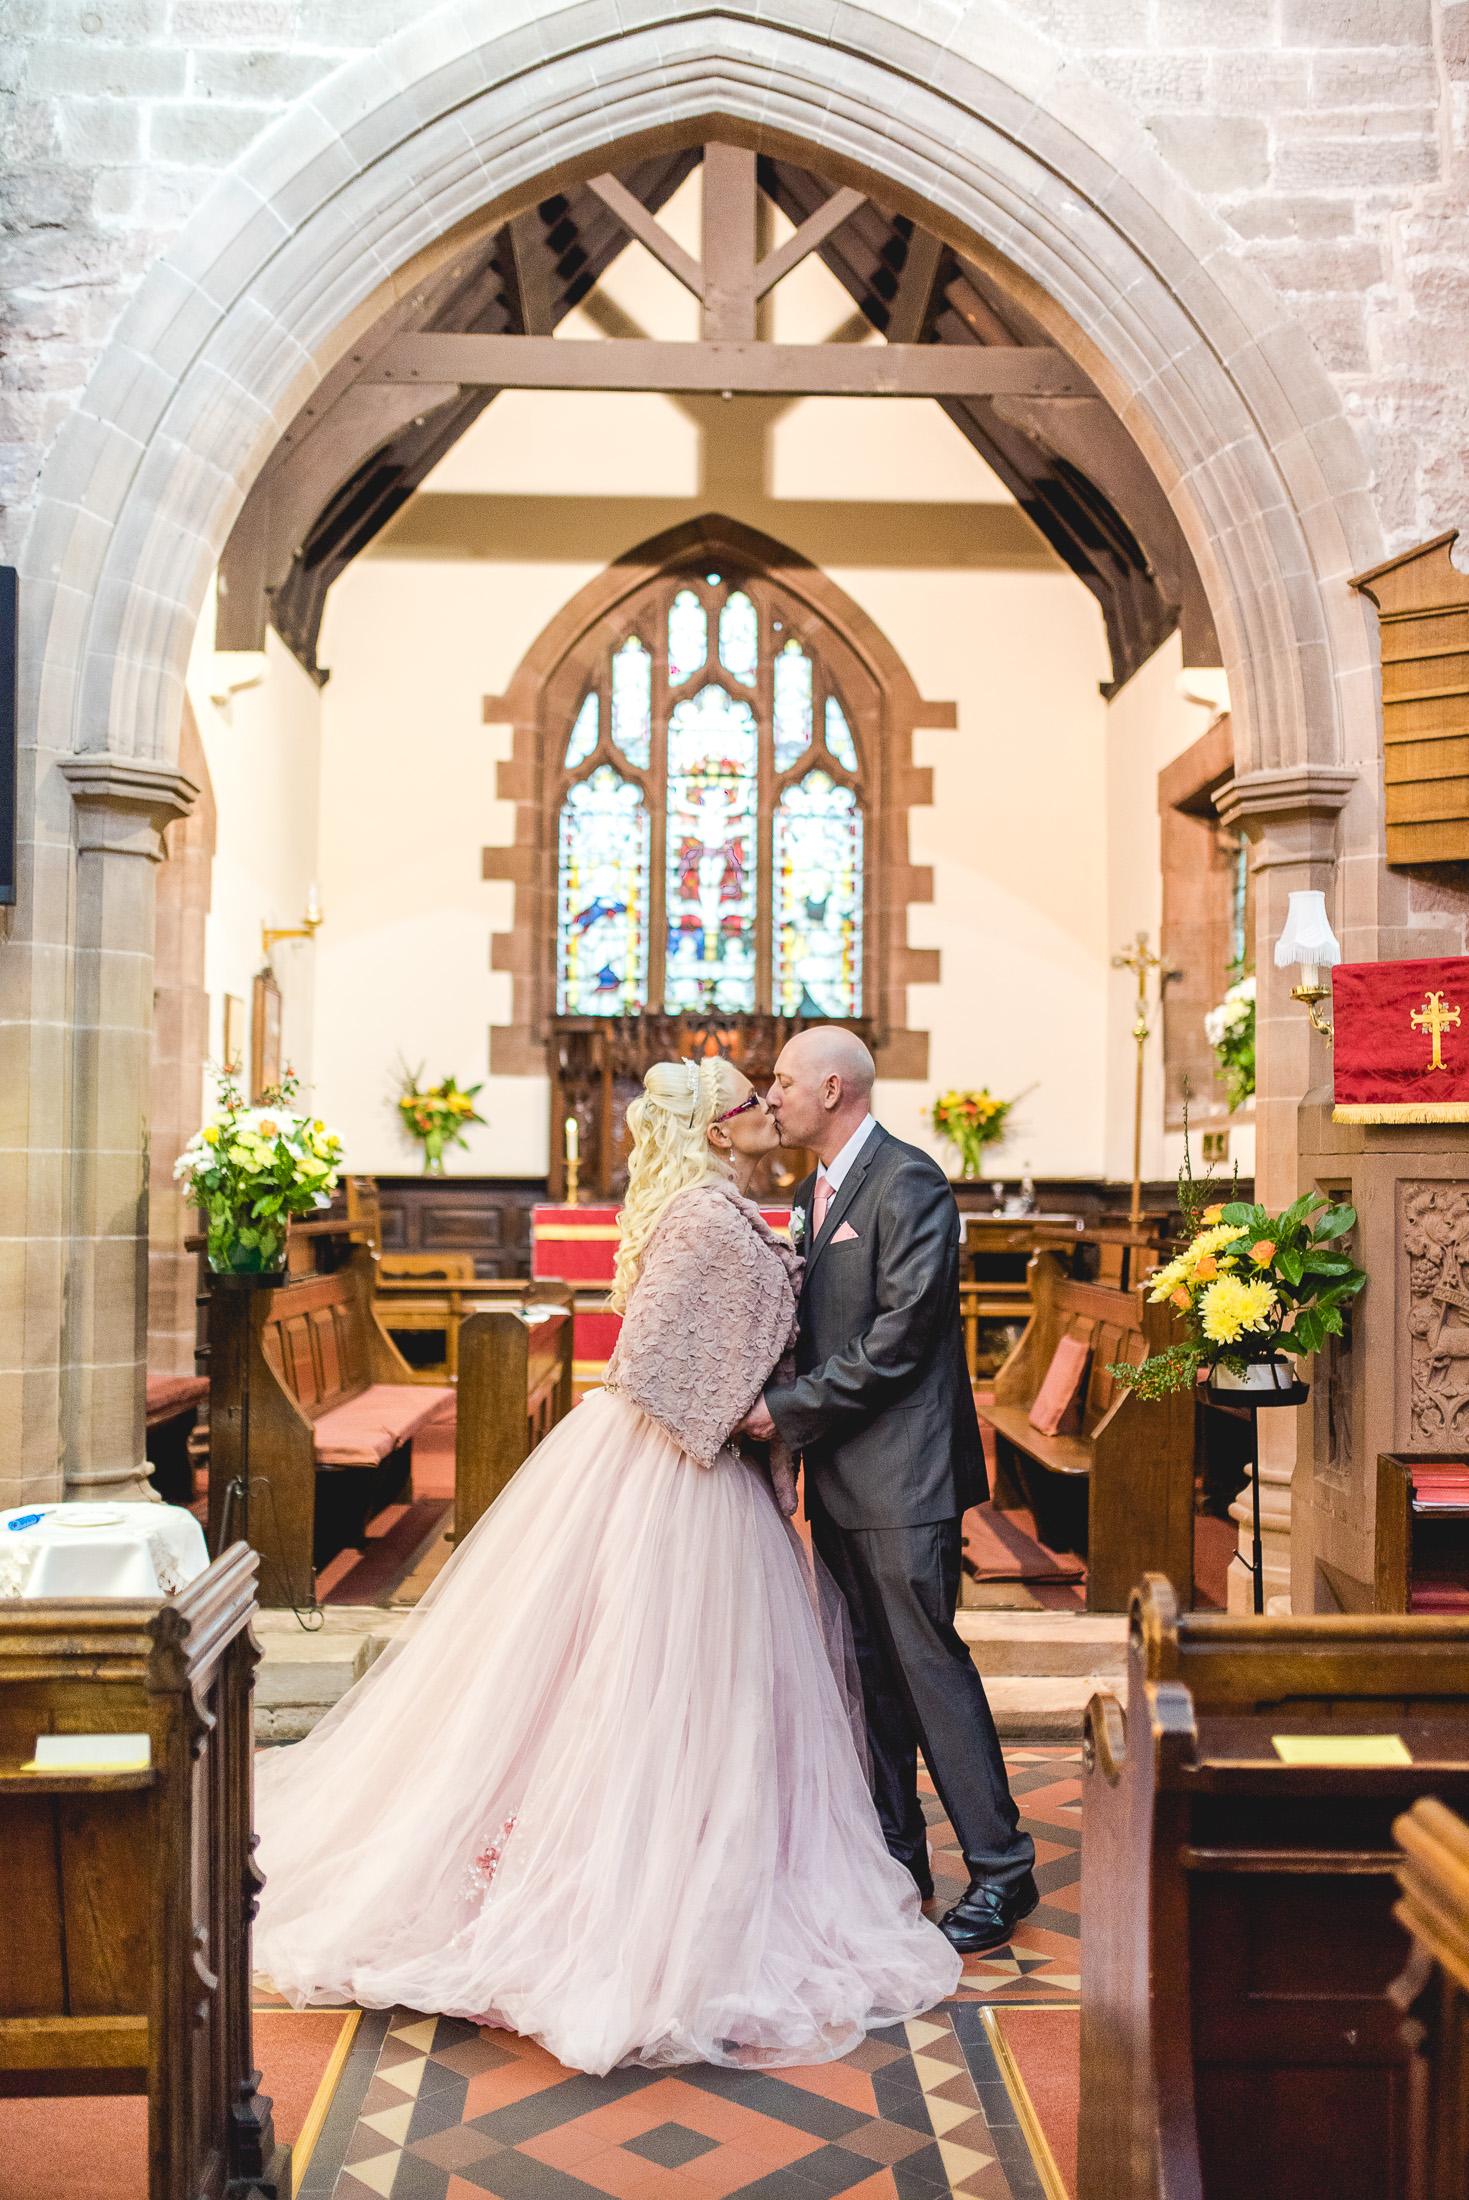 00020 Bride Groom Wedding Photography Staffordshire.jpg